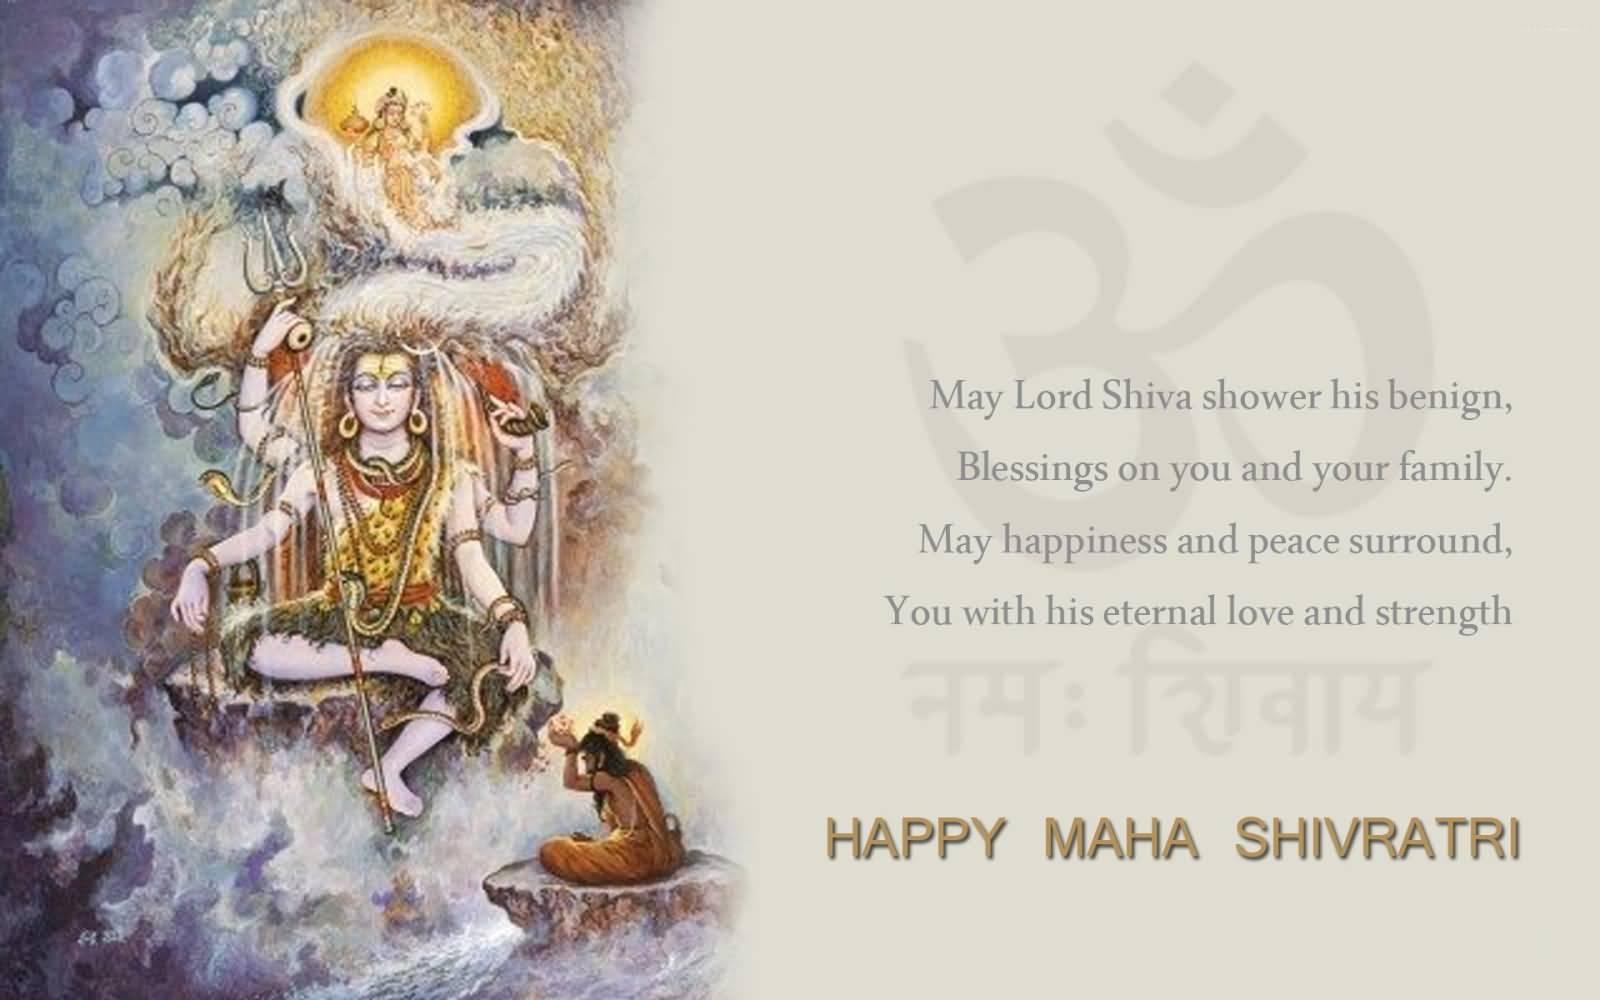 Maha Shivratri Cards